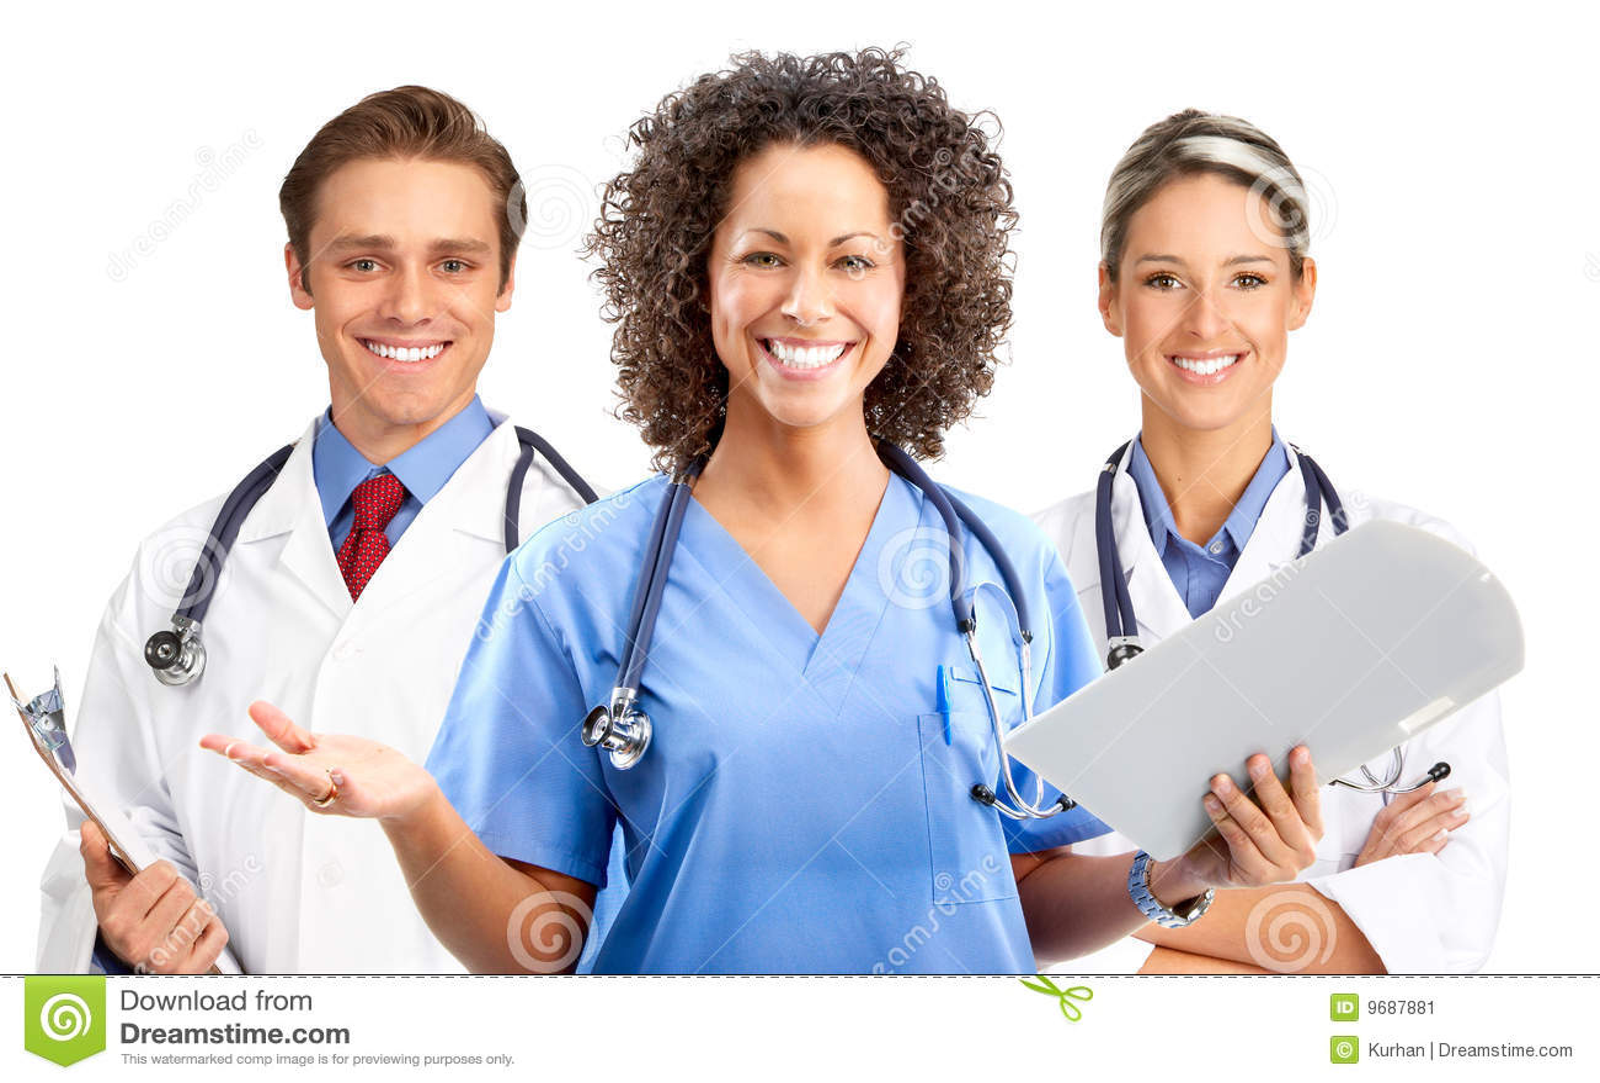 Medical People Stock Image Image 9687881